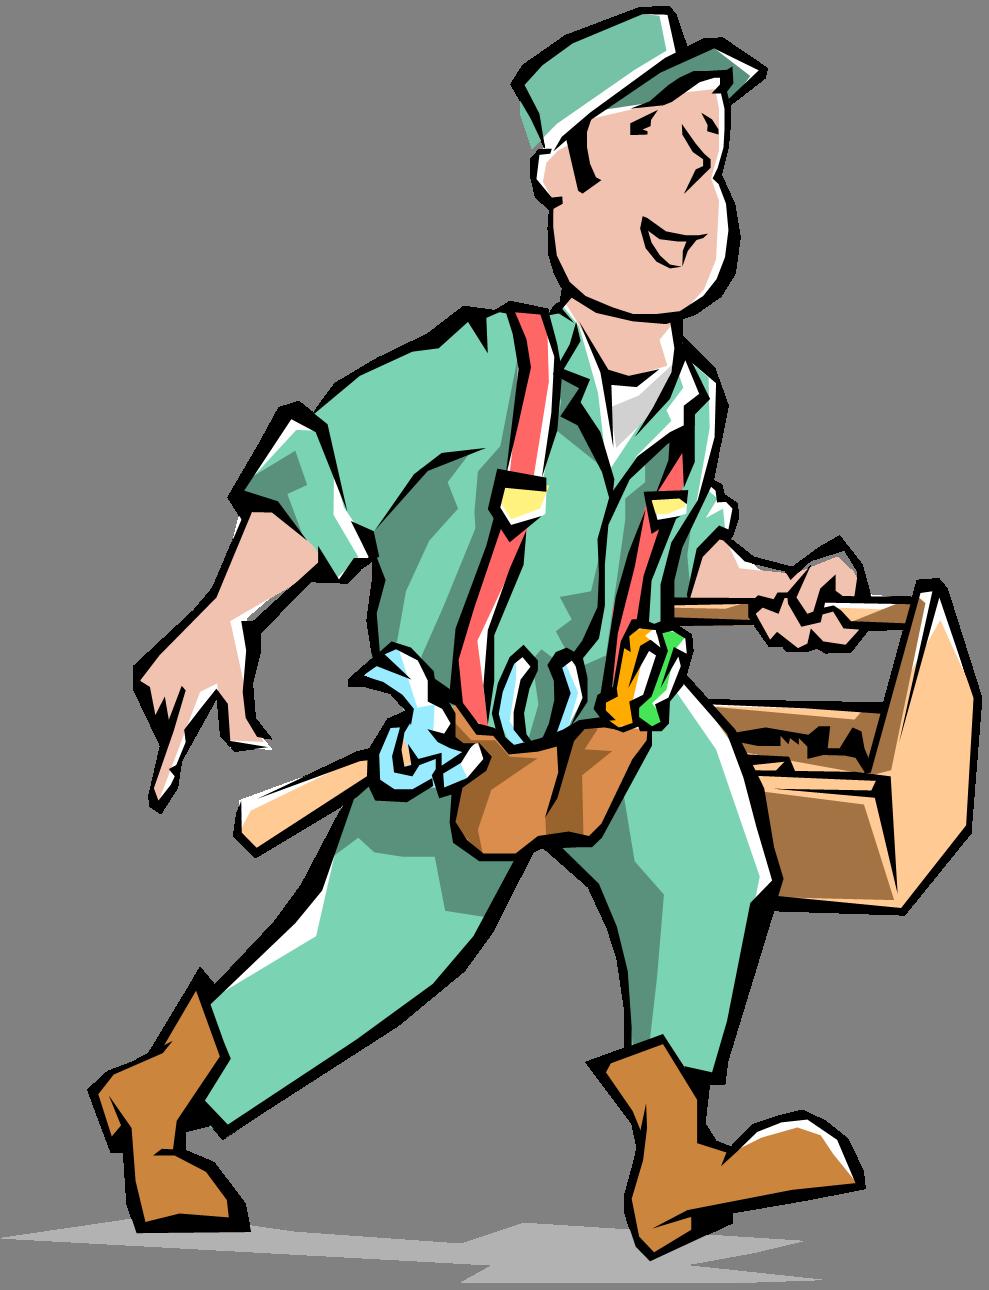 Maintenance clipart #7